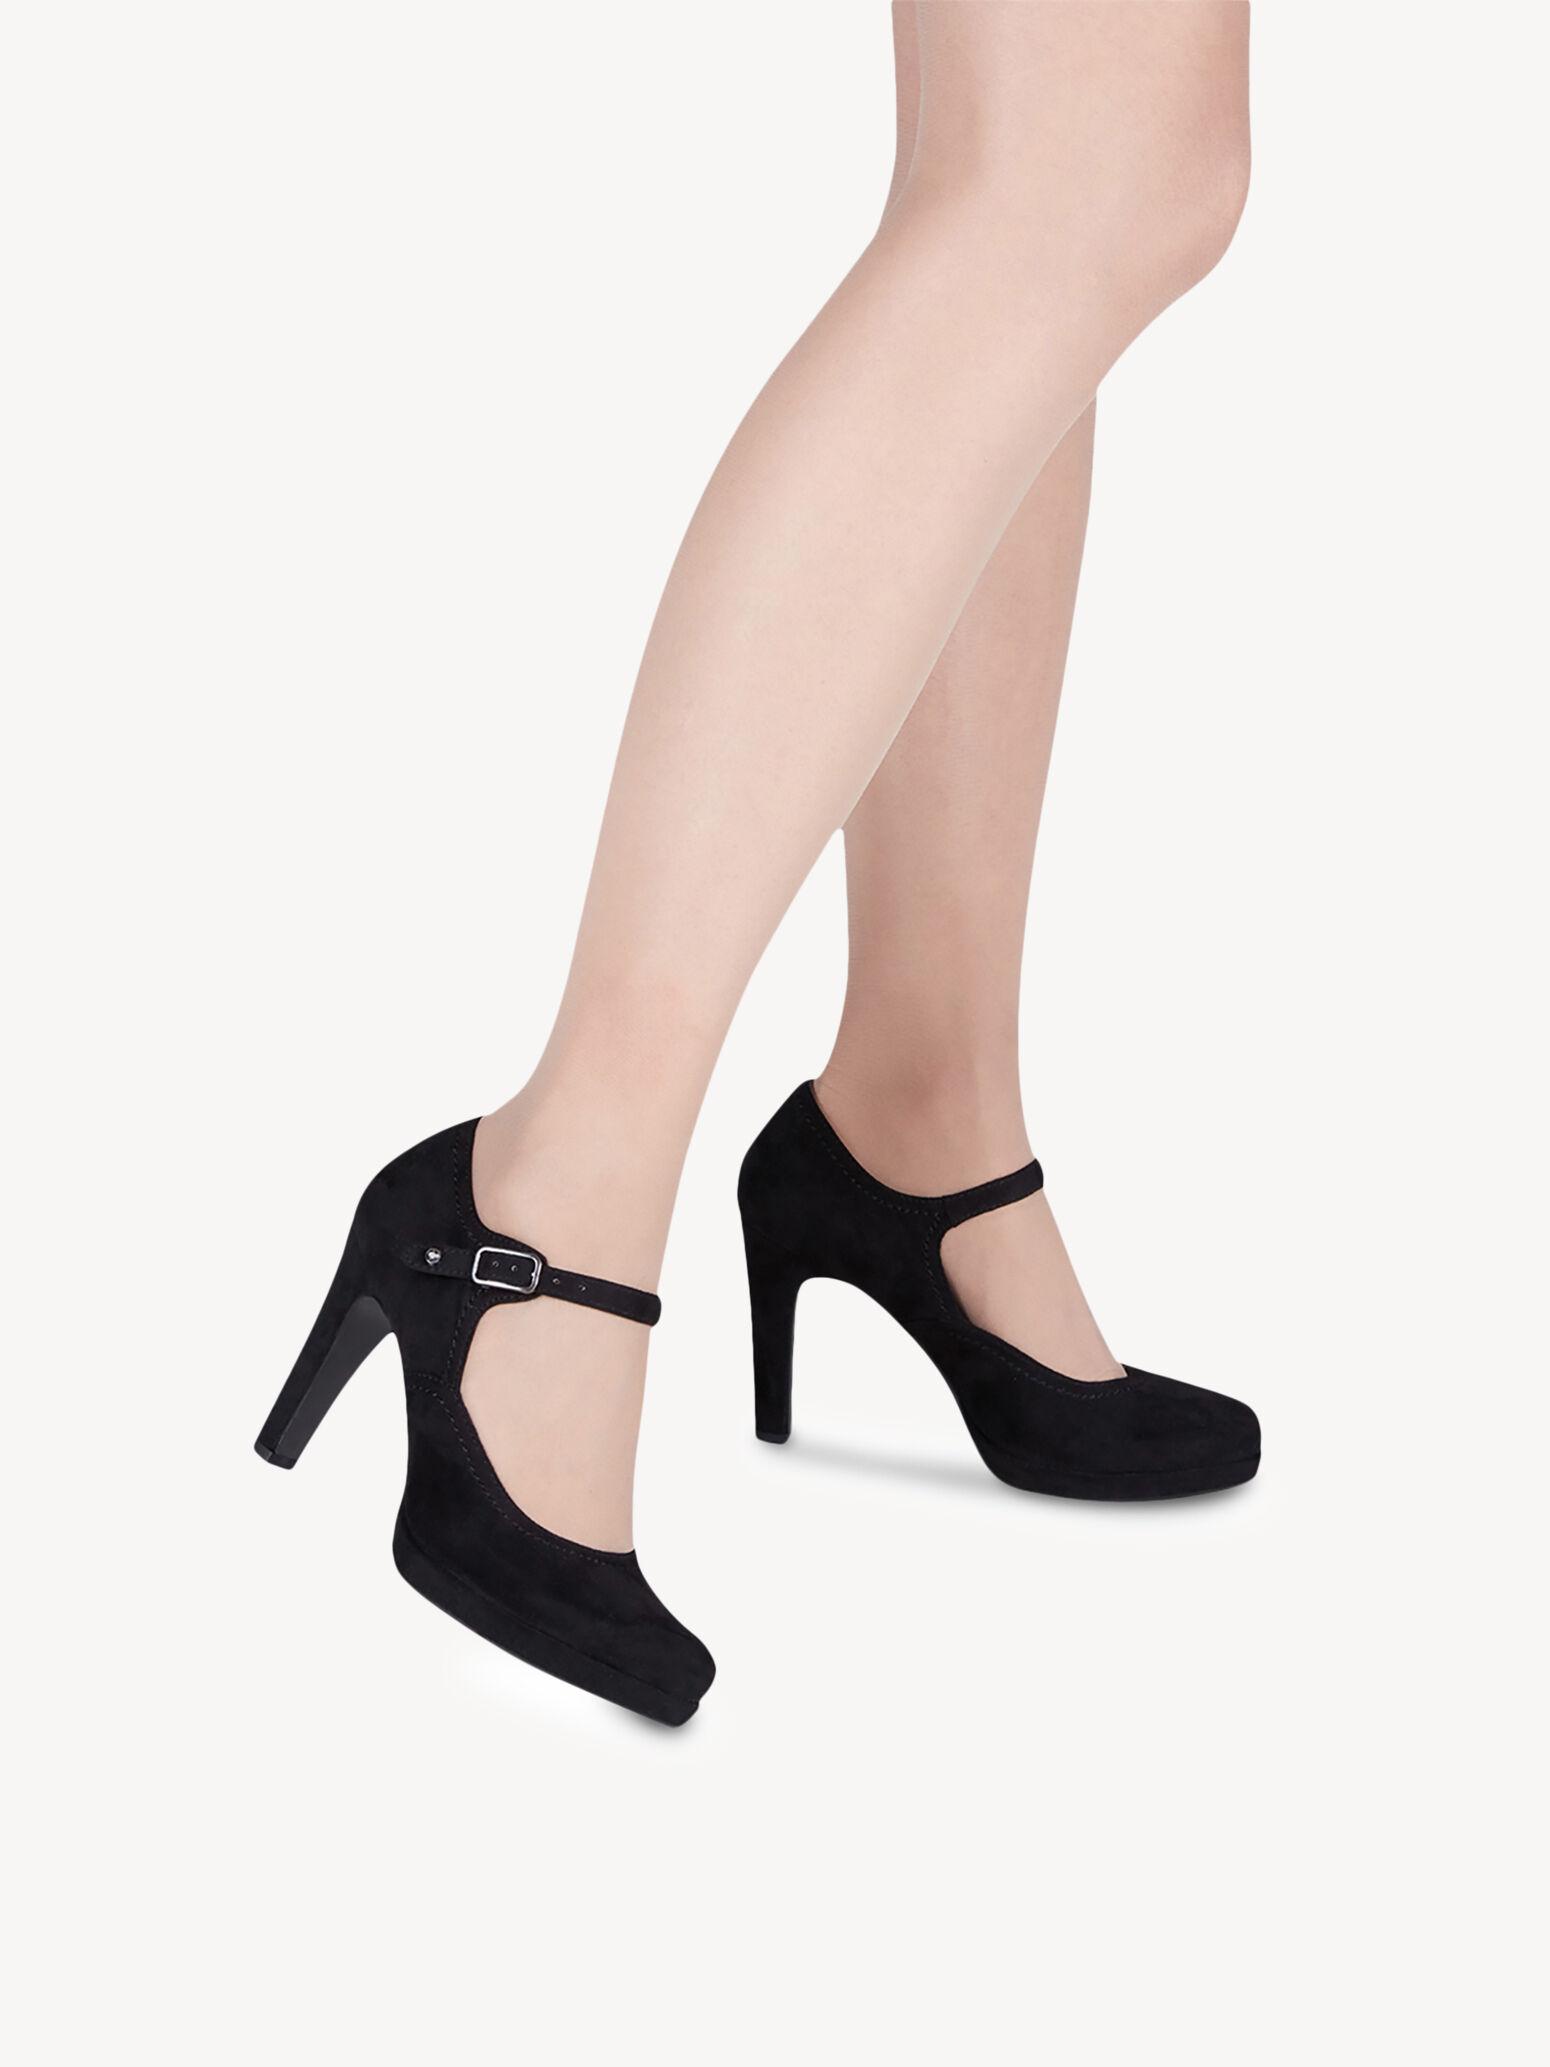 Gute Qualität TAMARIS Peeptoe Pumps Schwarz Verkauf Schuhe